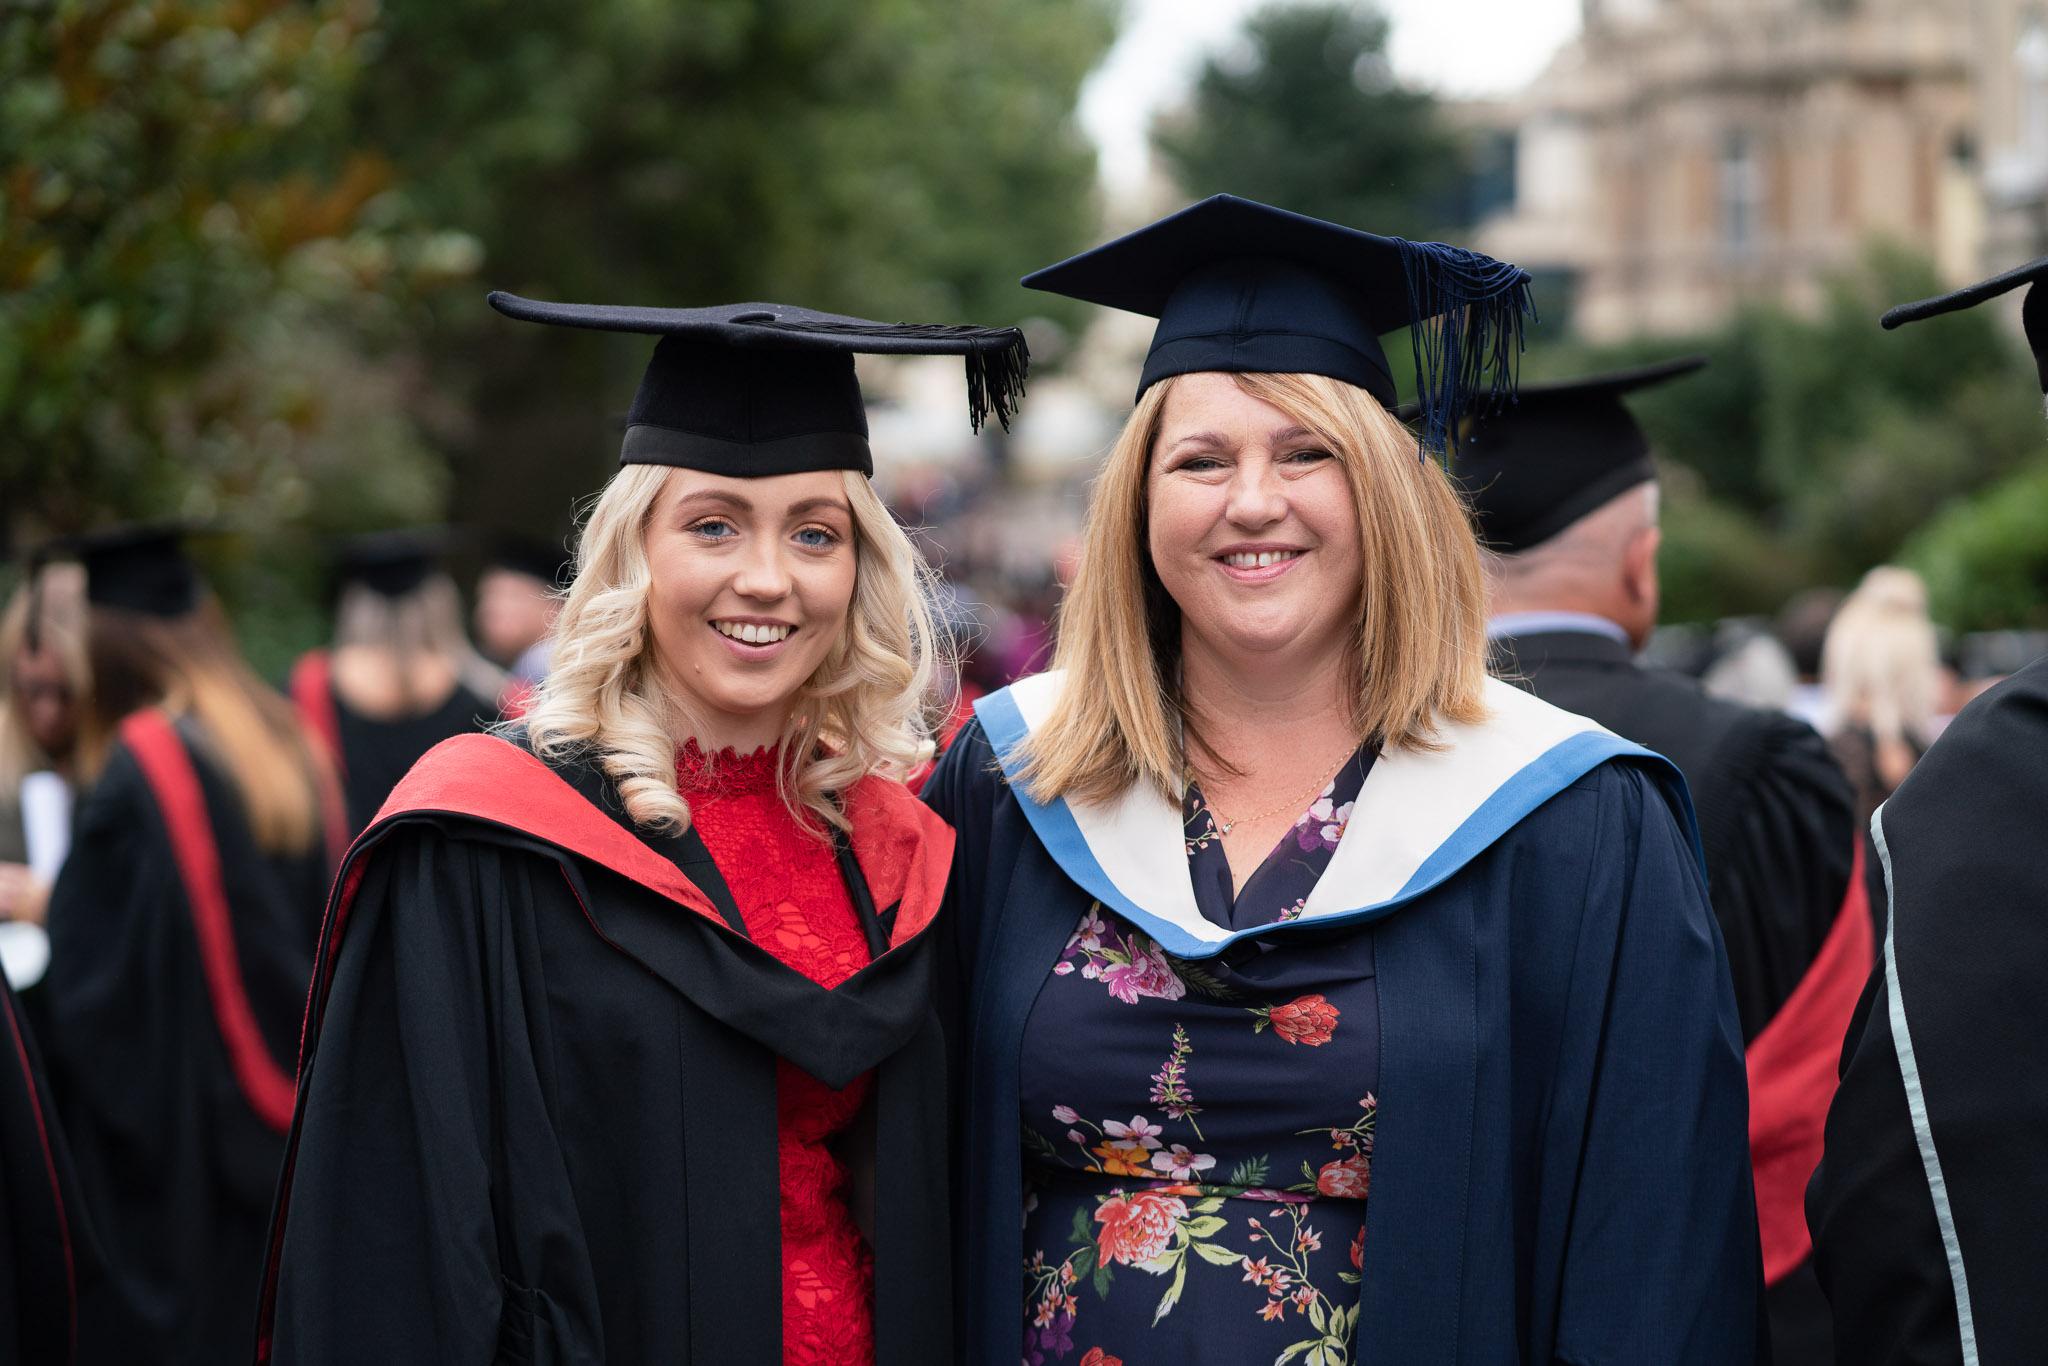 Lauren and Joanne Pendleton - UCW Graduation 2018